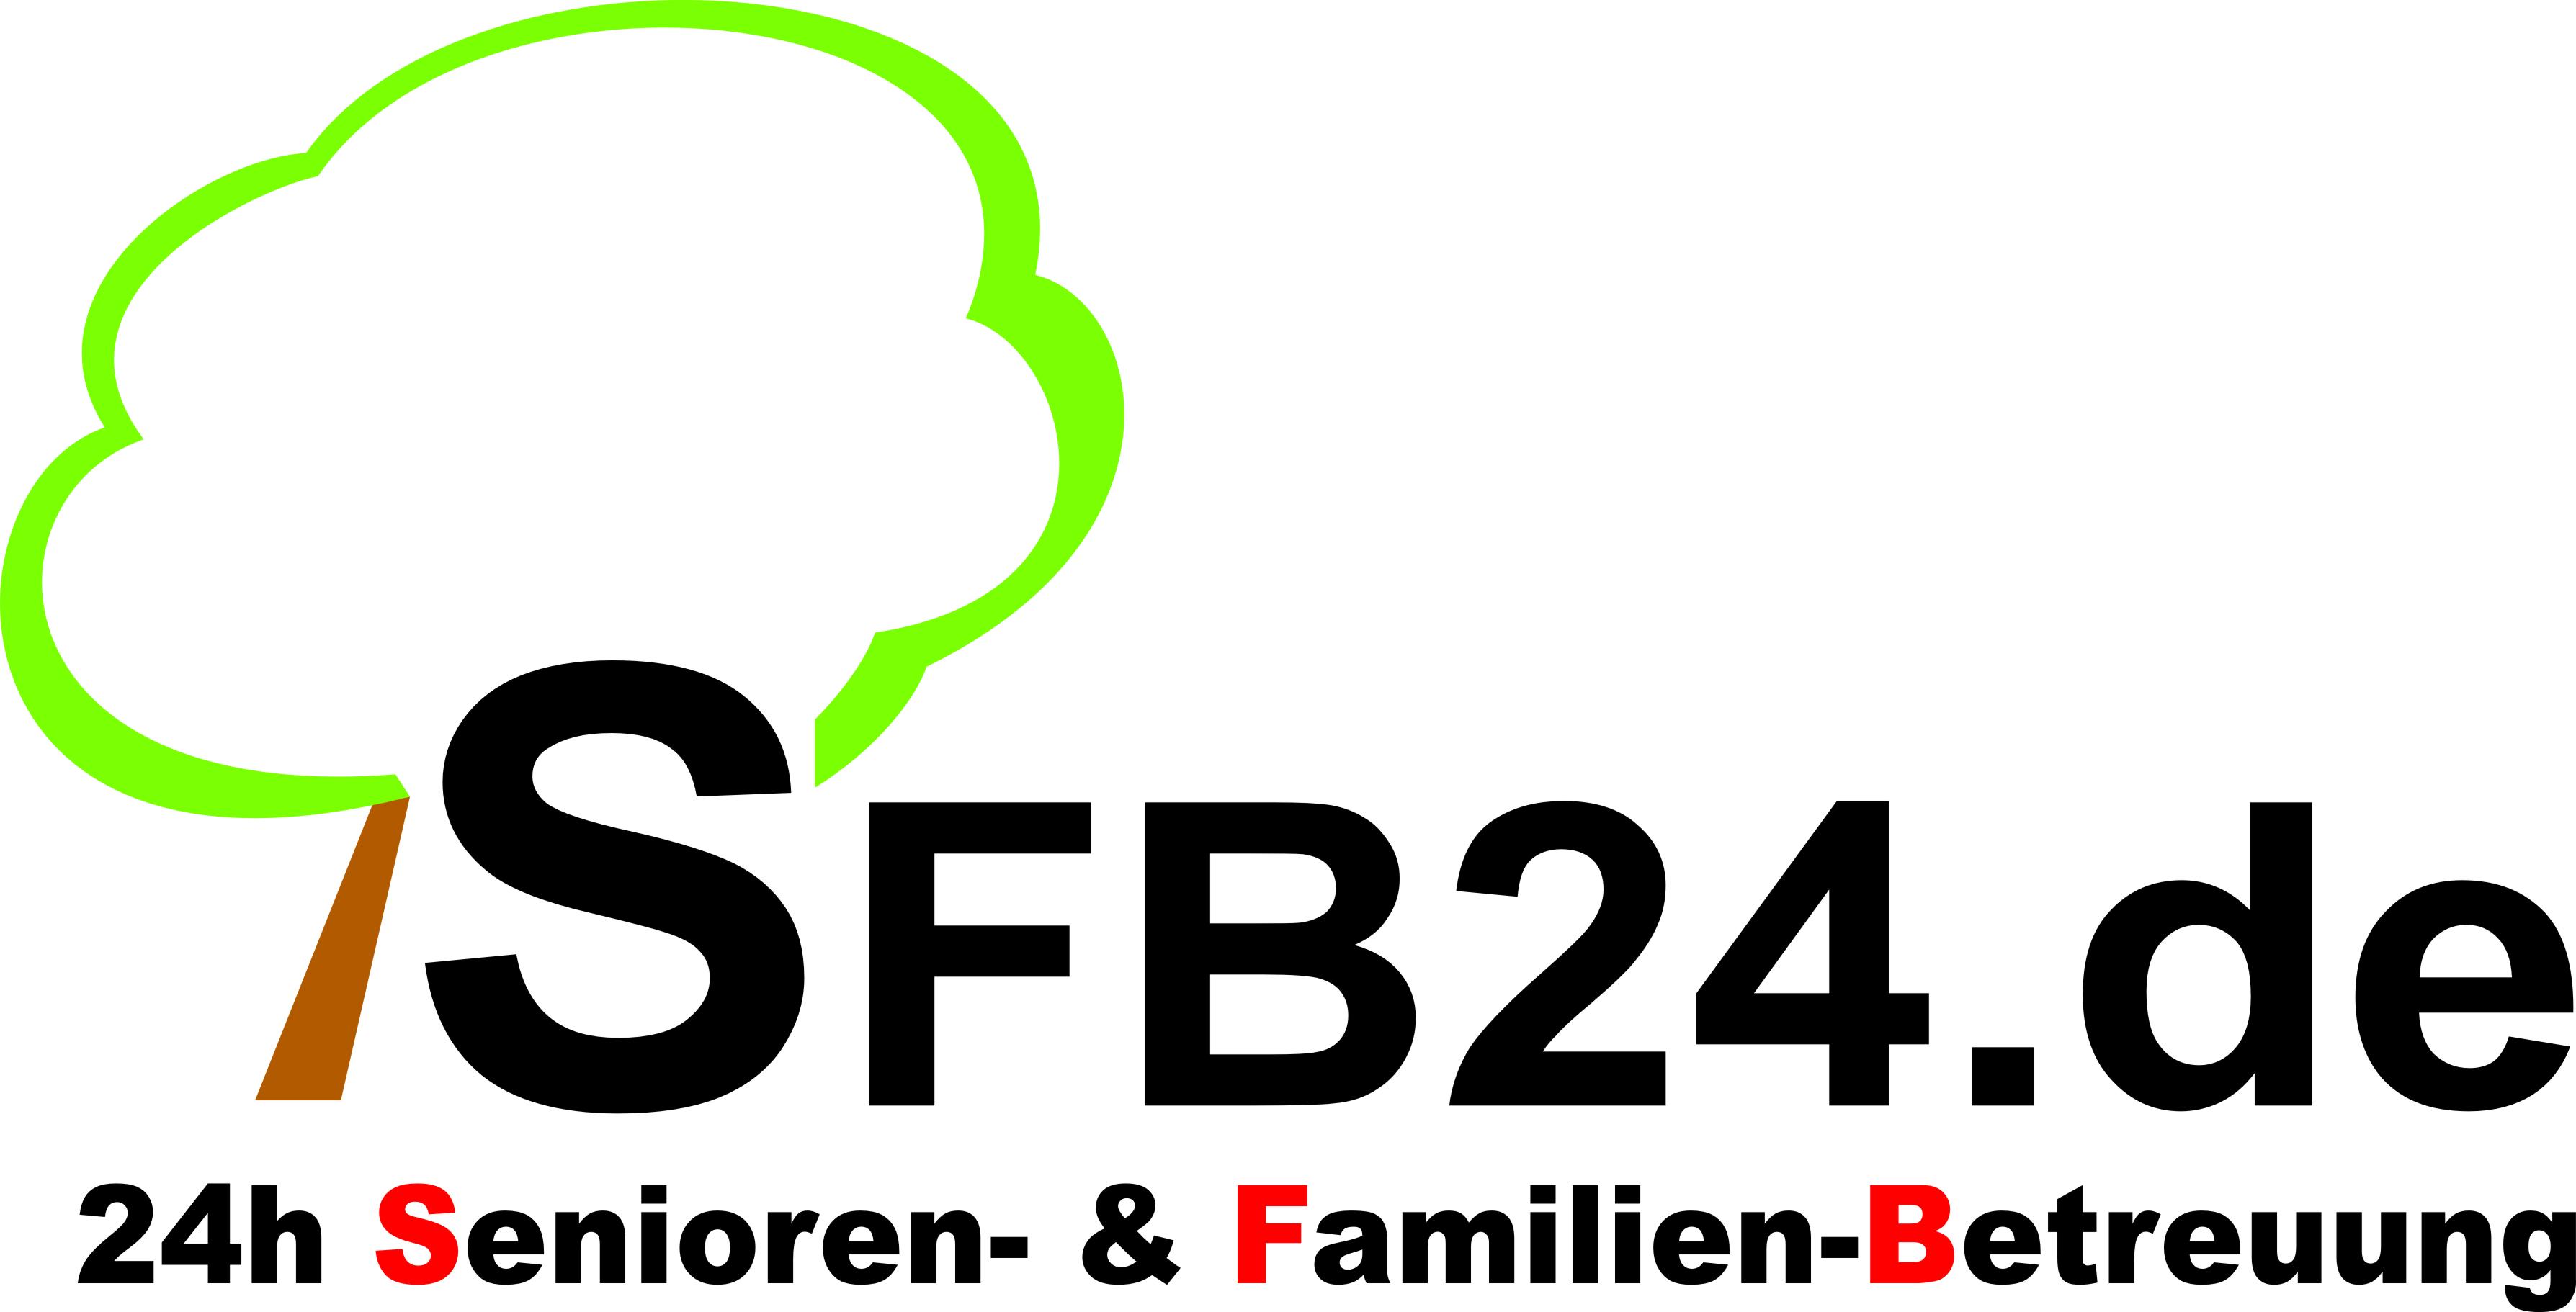 SFB 24 - Senioren- & Familienbetreuung